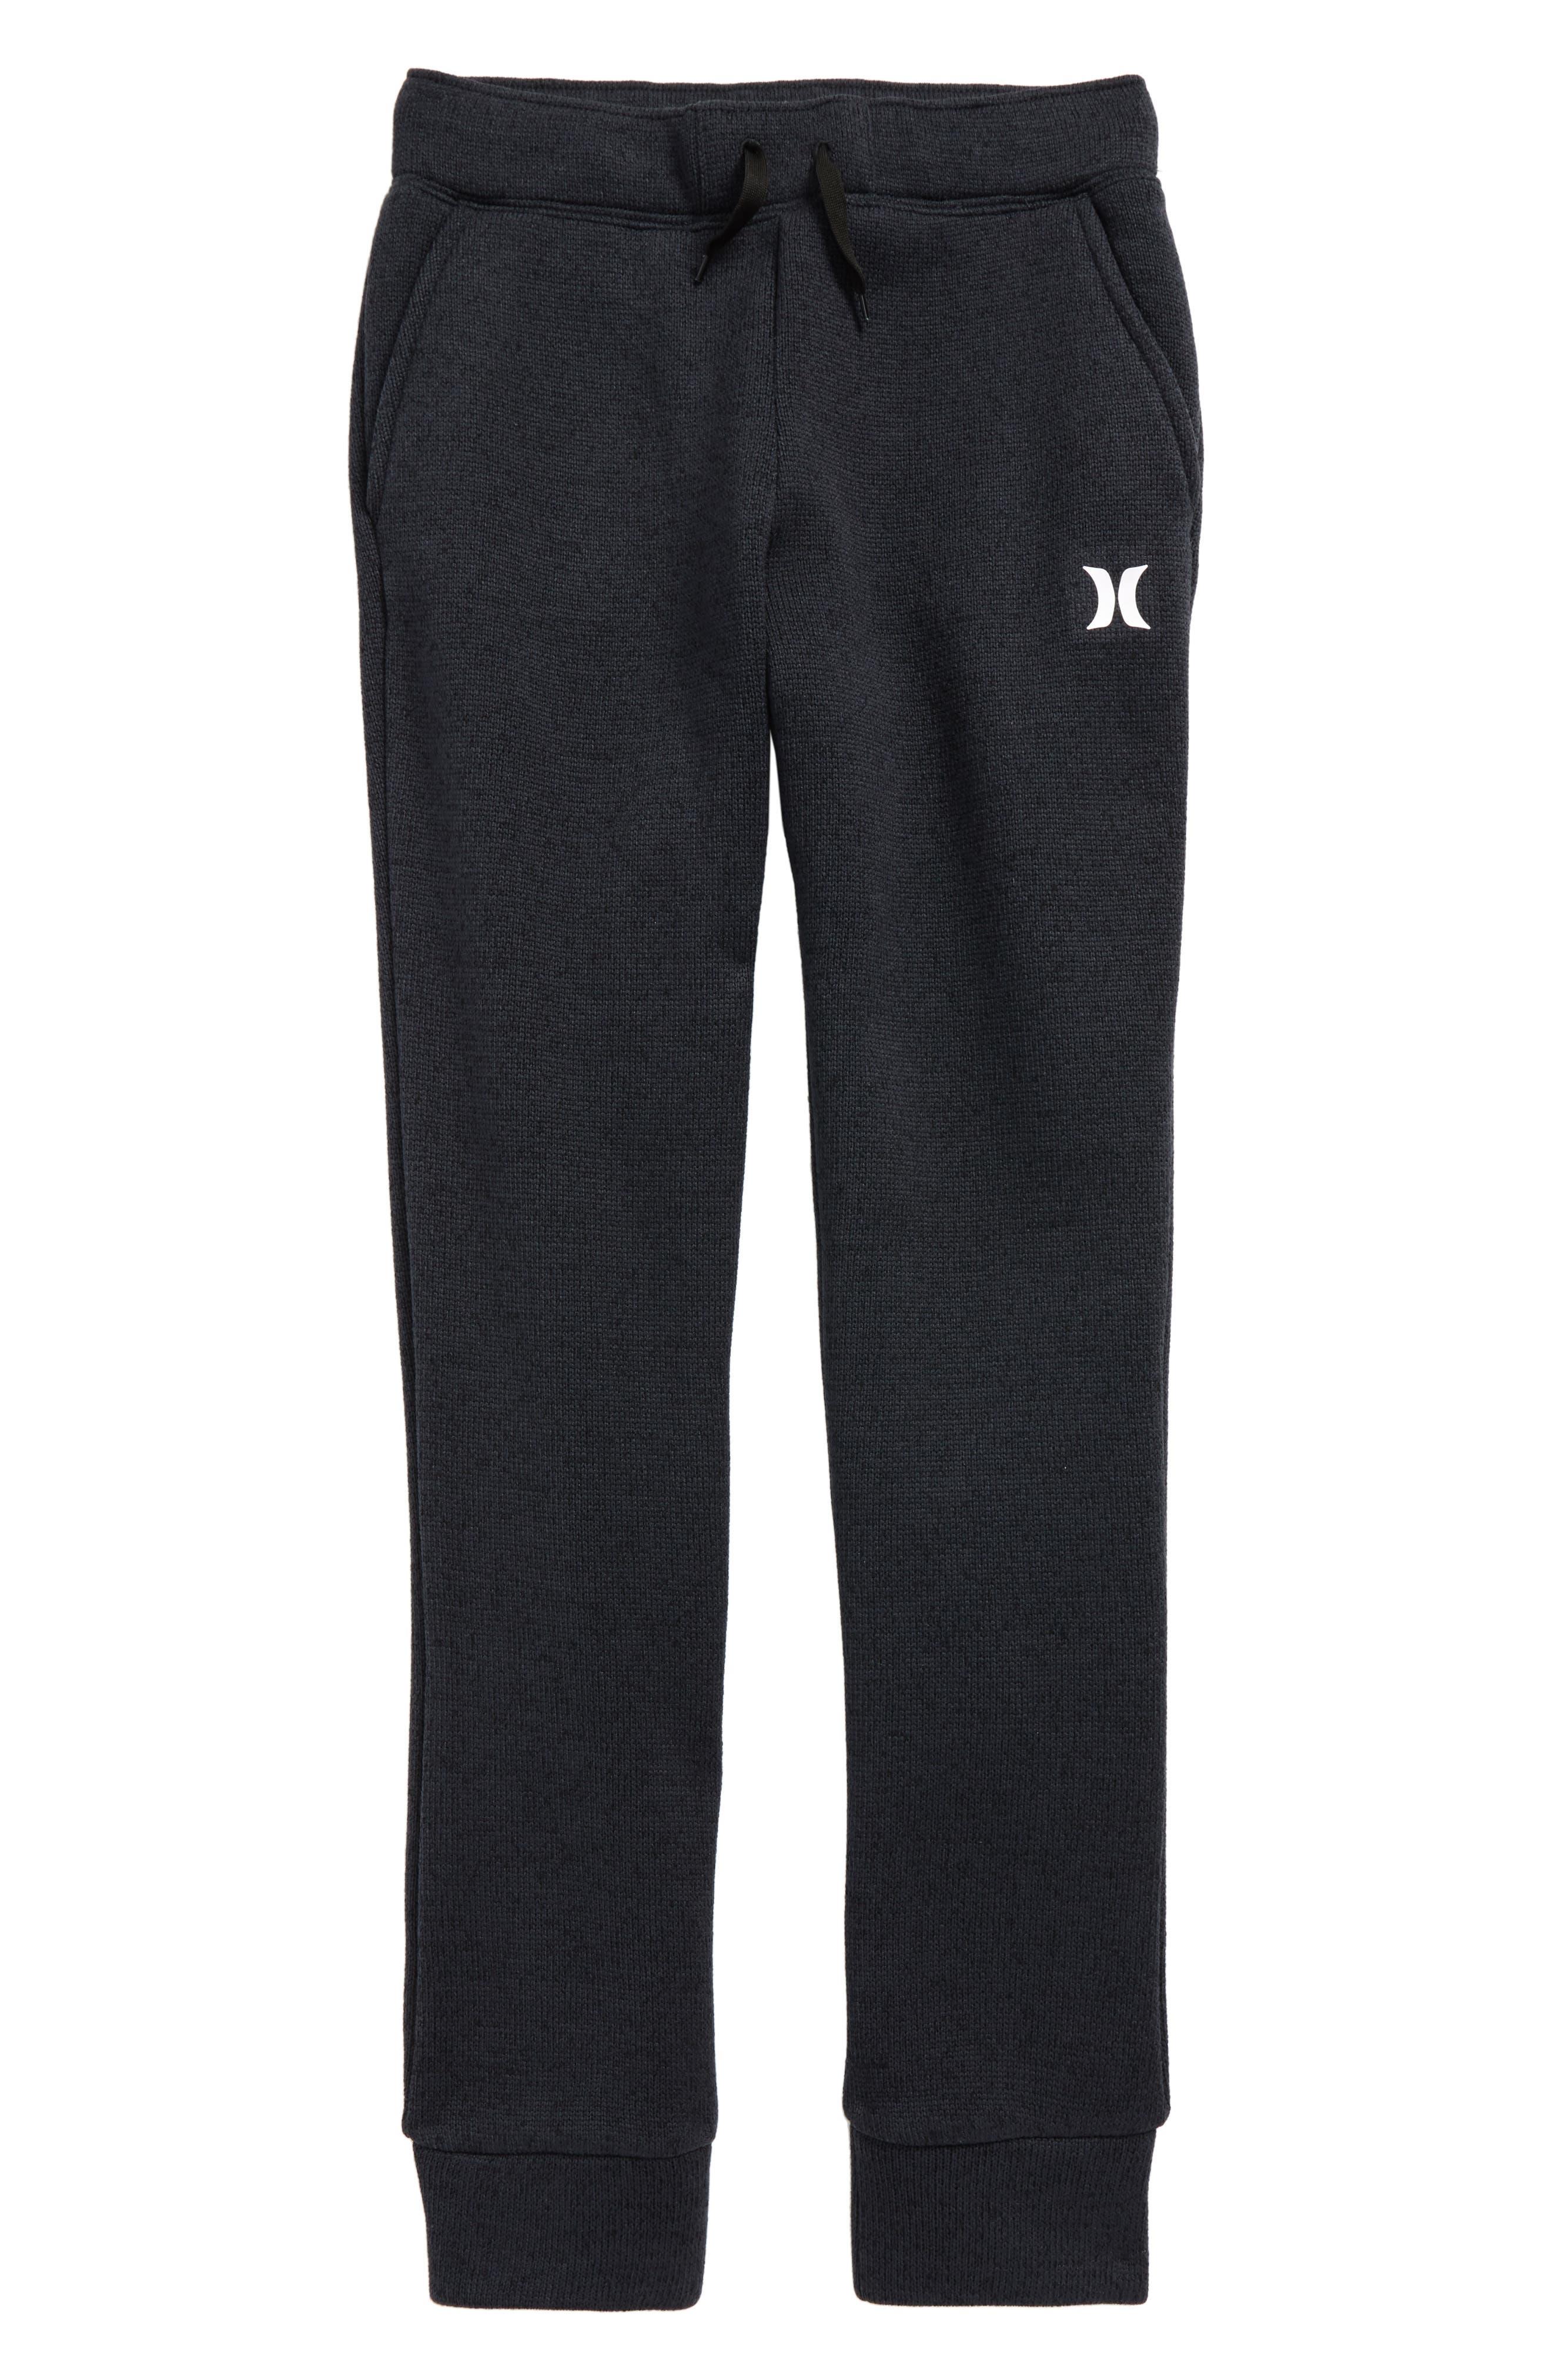 Sweater Knit Fleece Pants,                             Main thumbnail 1, color,